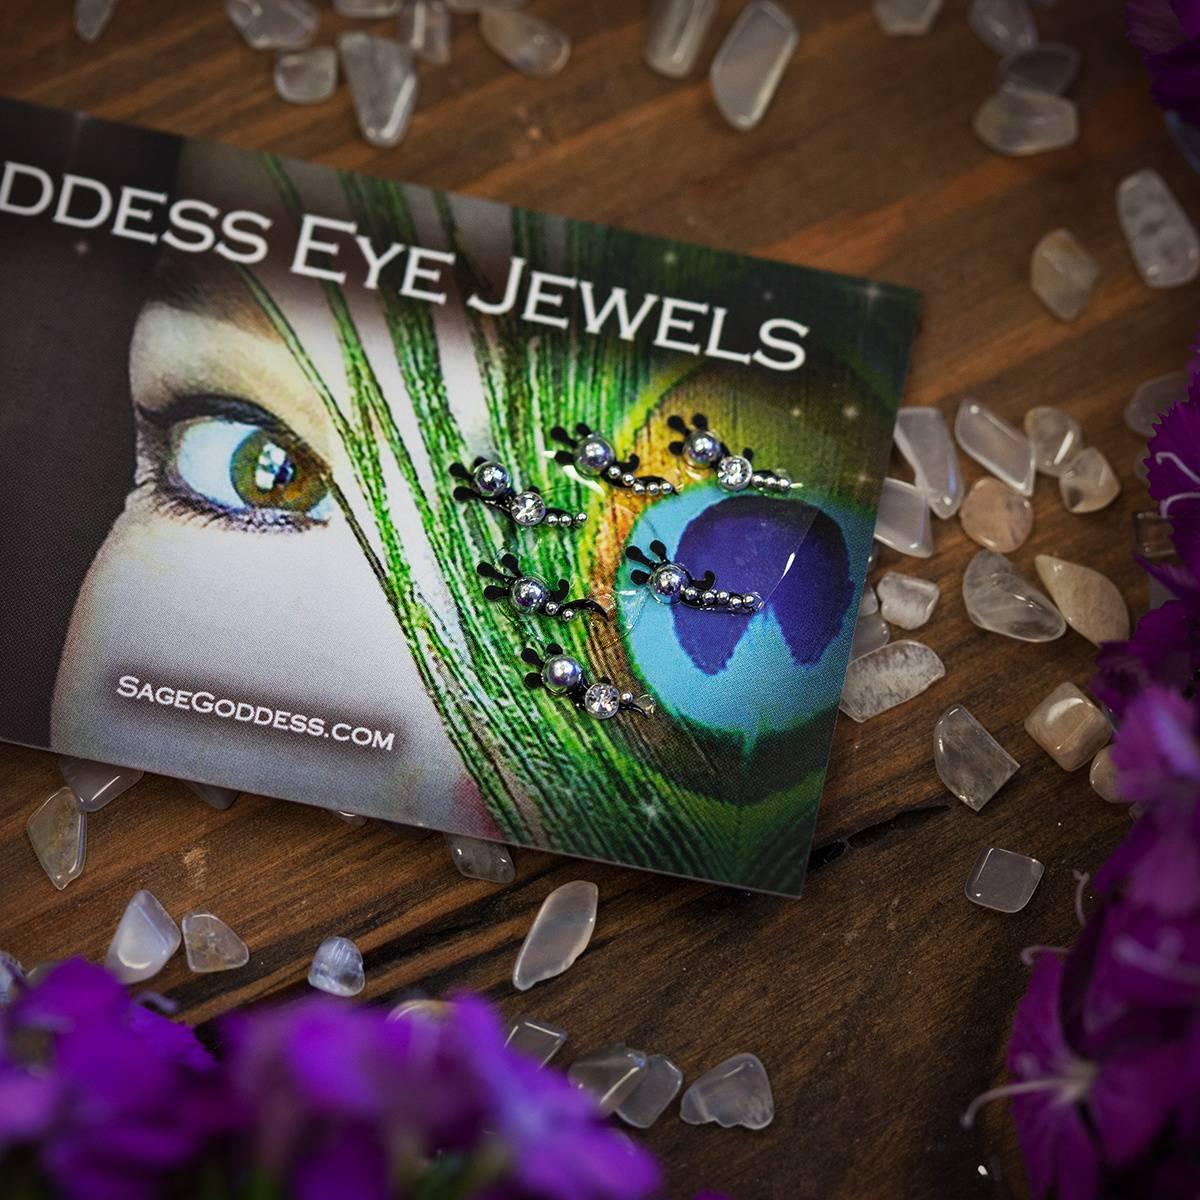 Goddess Eye Jewels 6_25 seventh